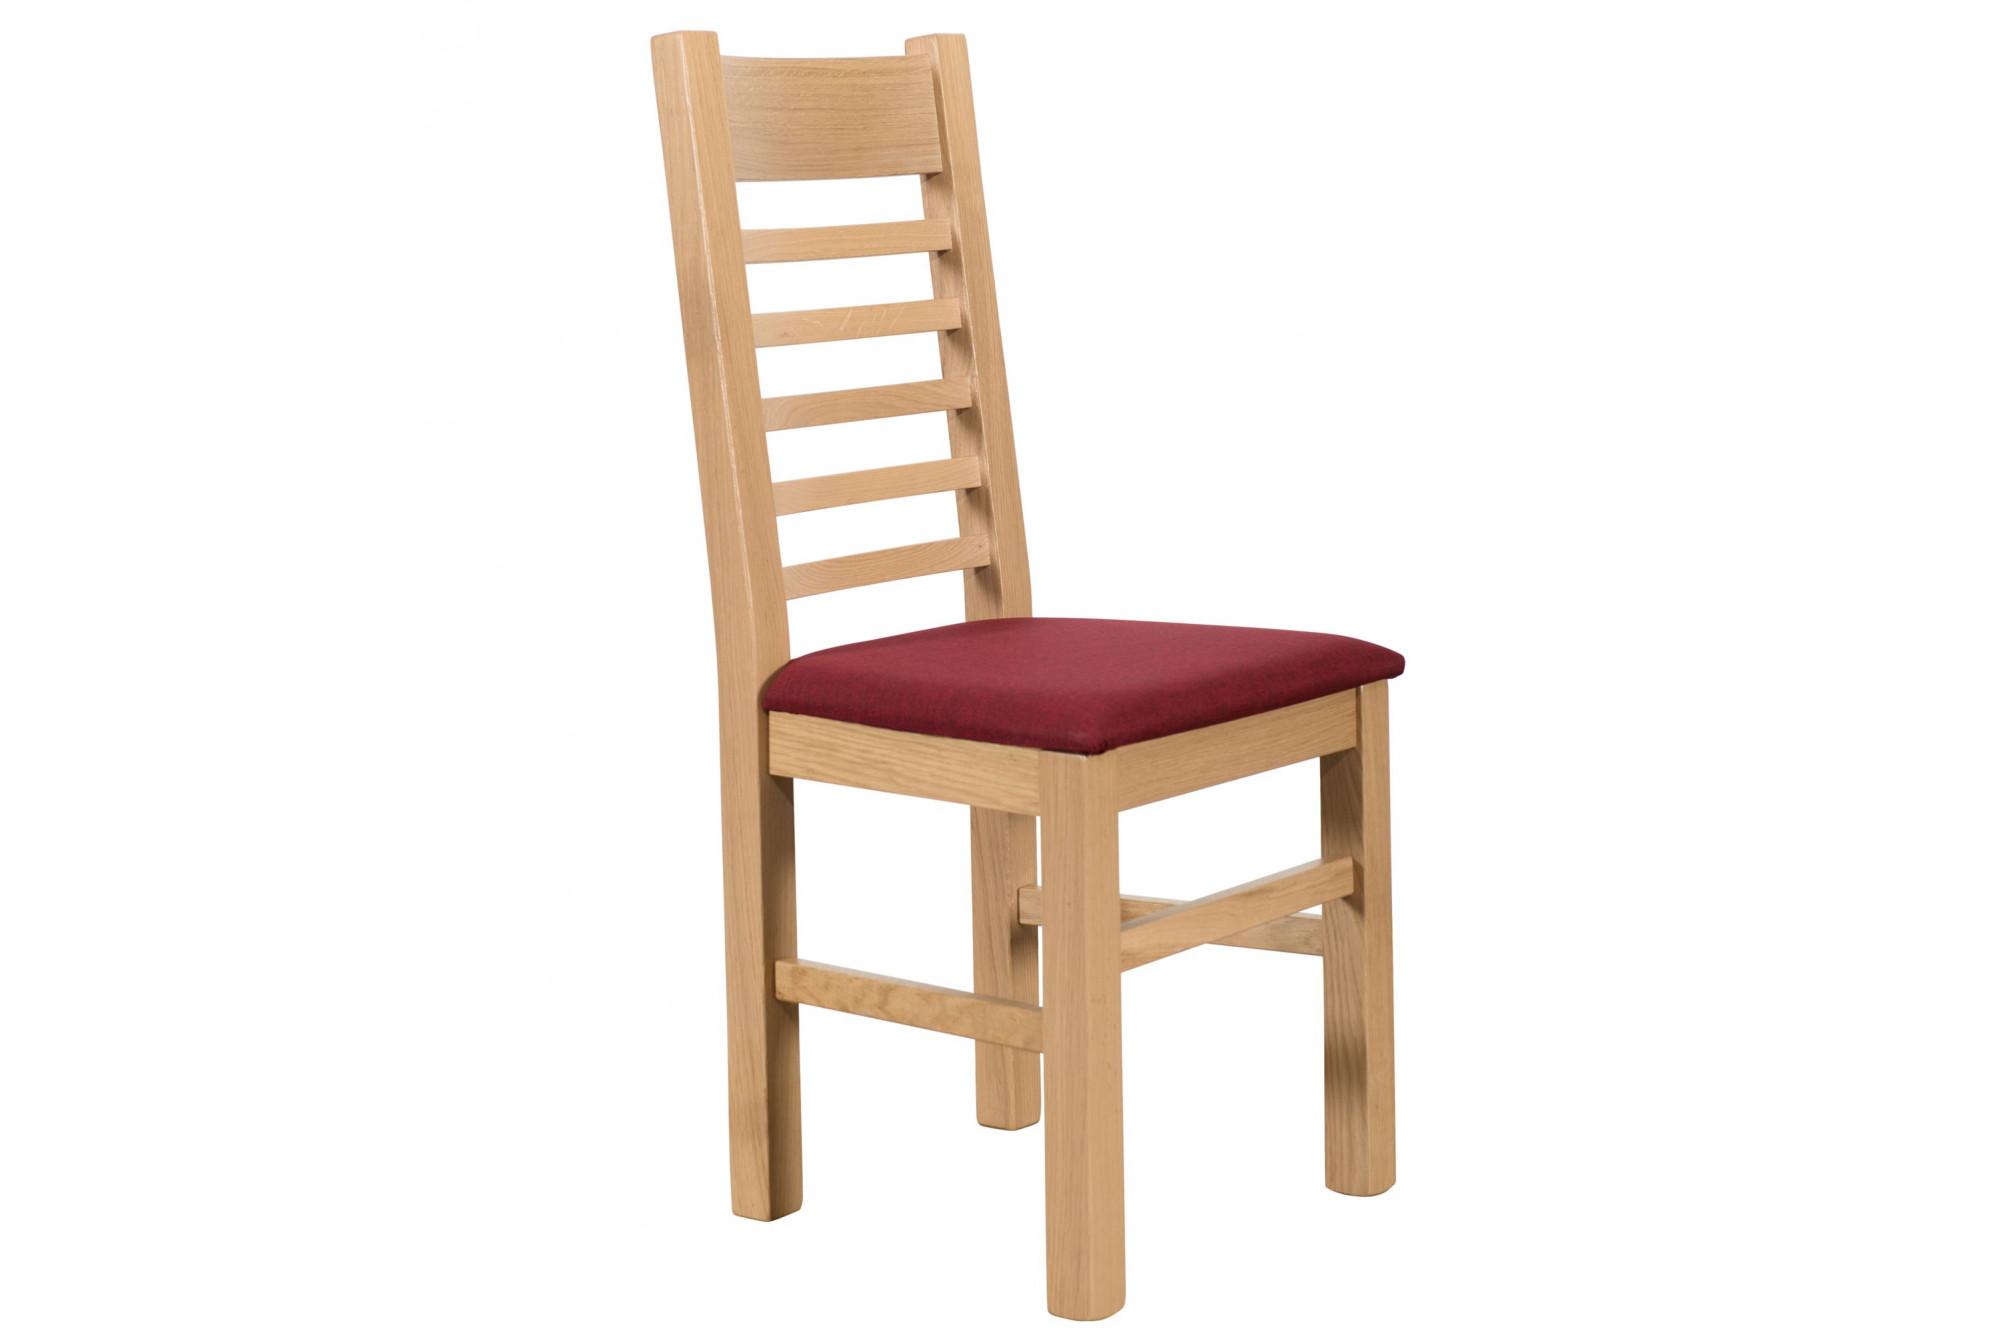 chaise en ch ne massif blanchi boston assise framboise hellin. Black Bedroom Furniture Sets. Home Design Ideas